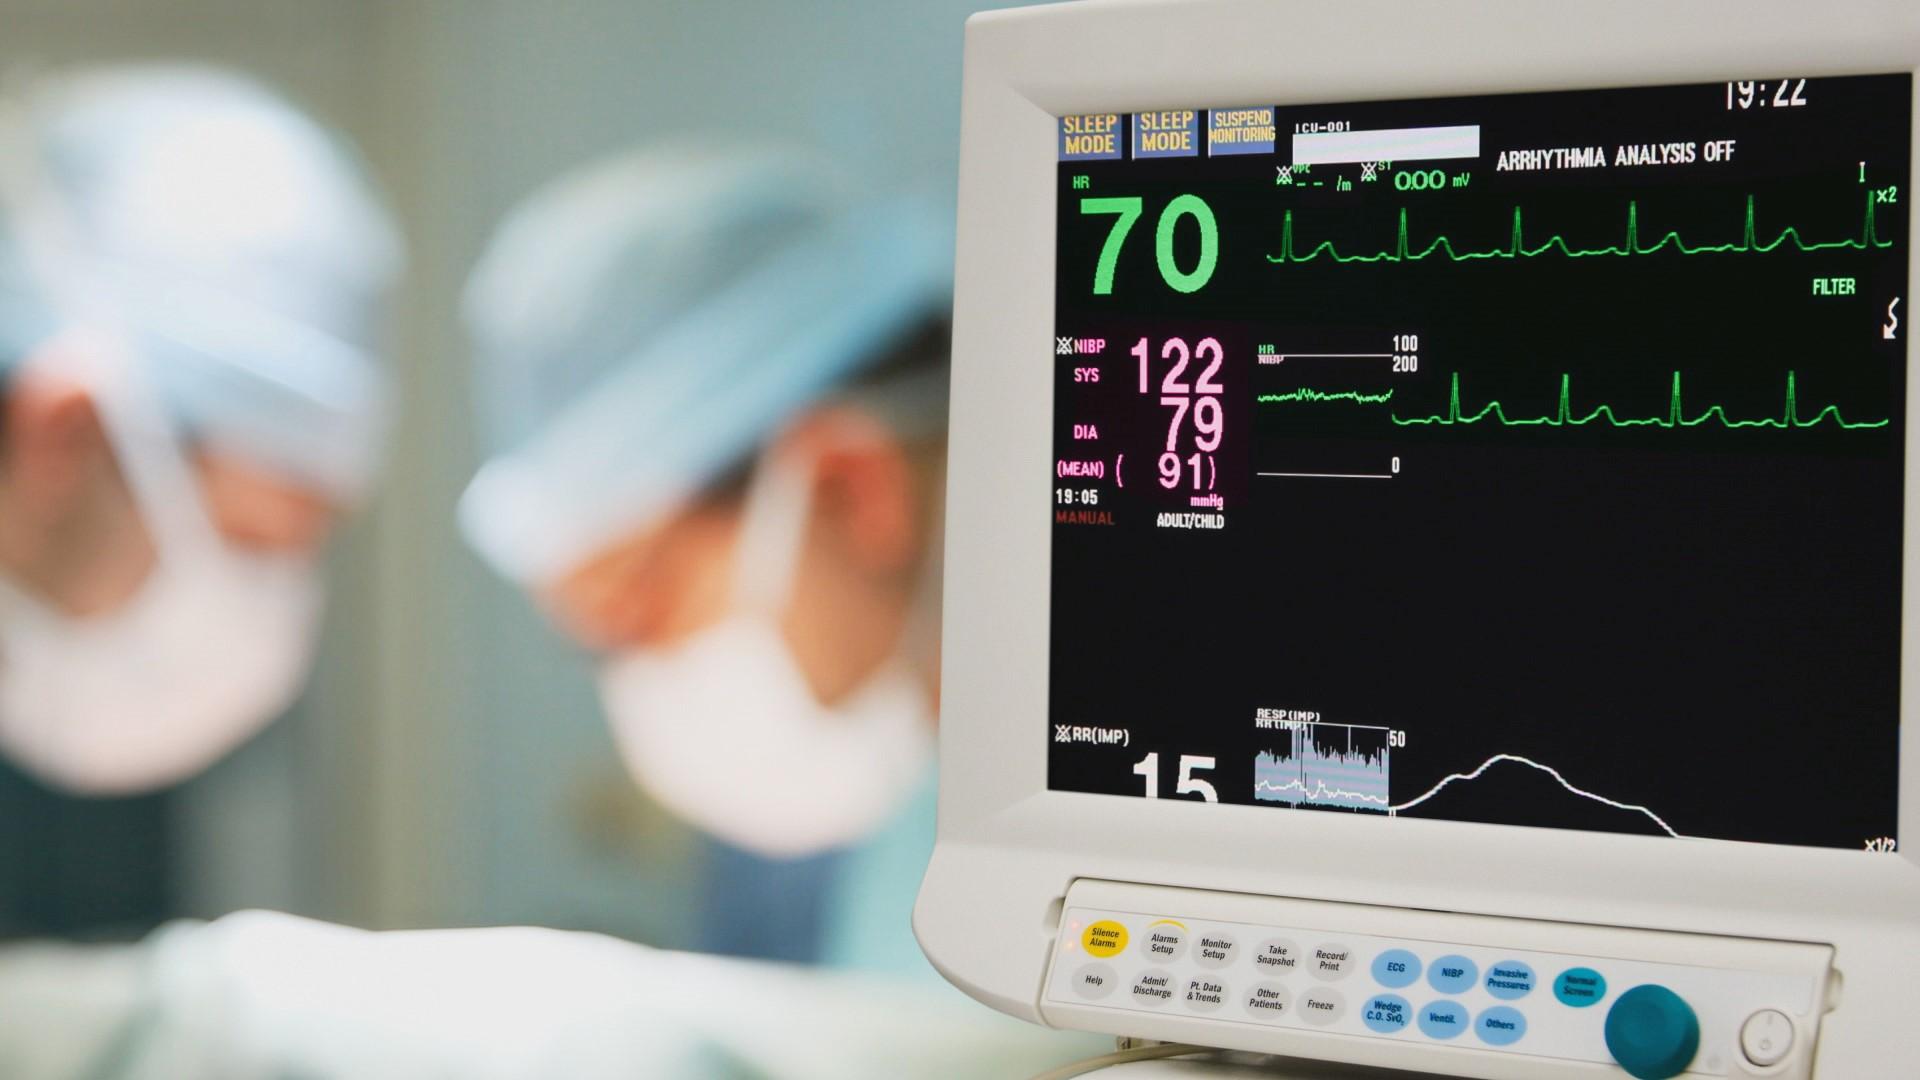 Foothill Regional Medical Center image 2